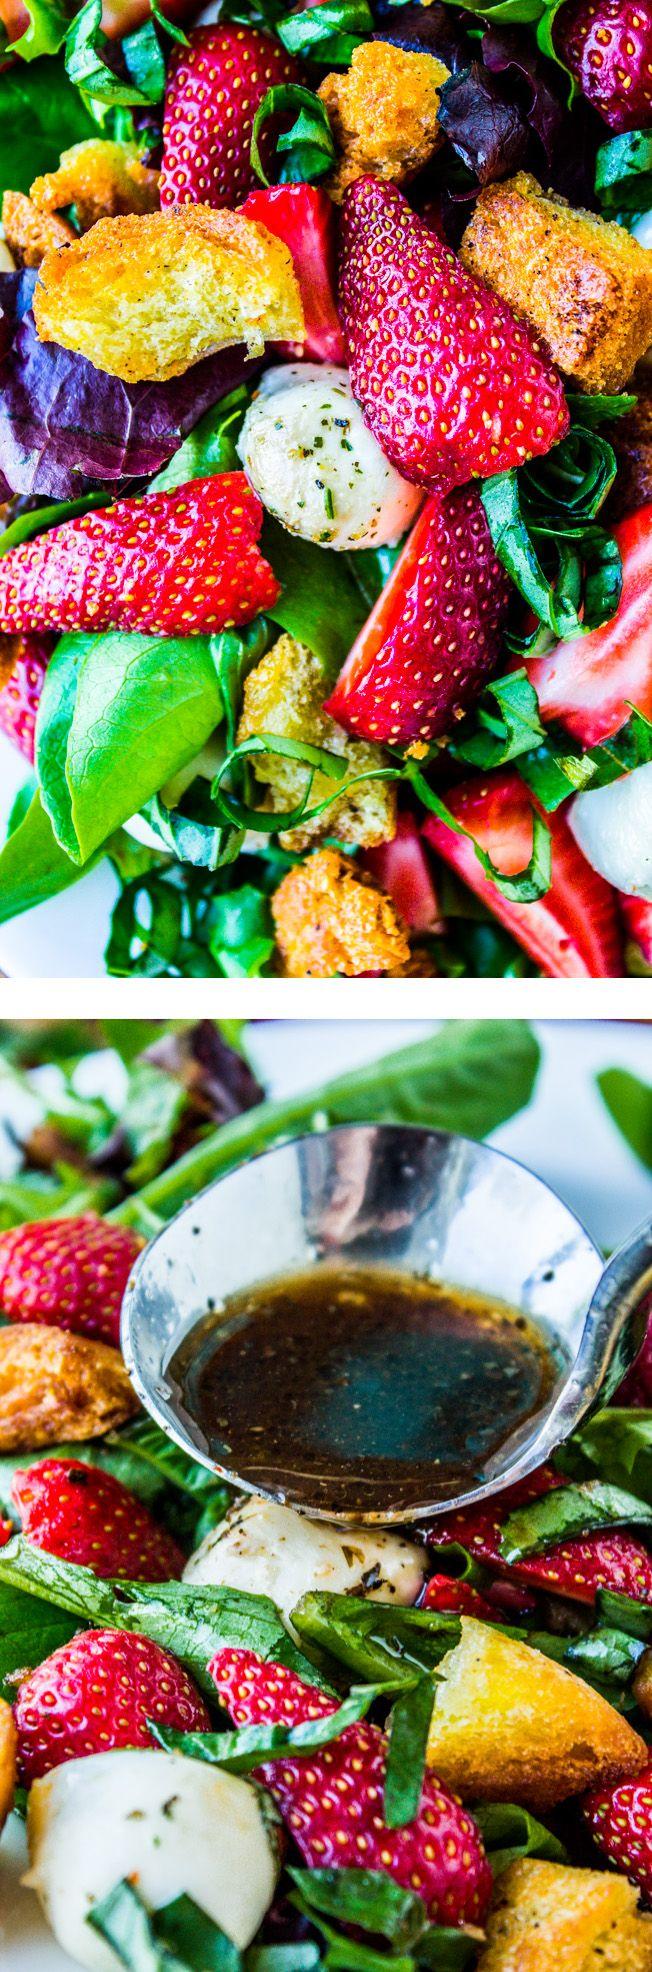 Strawberry Panzanella Salad from The Food Charlatan